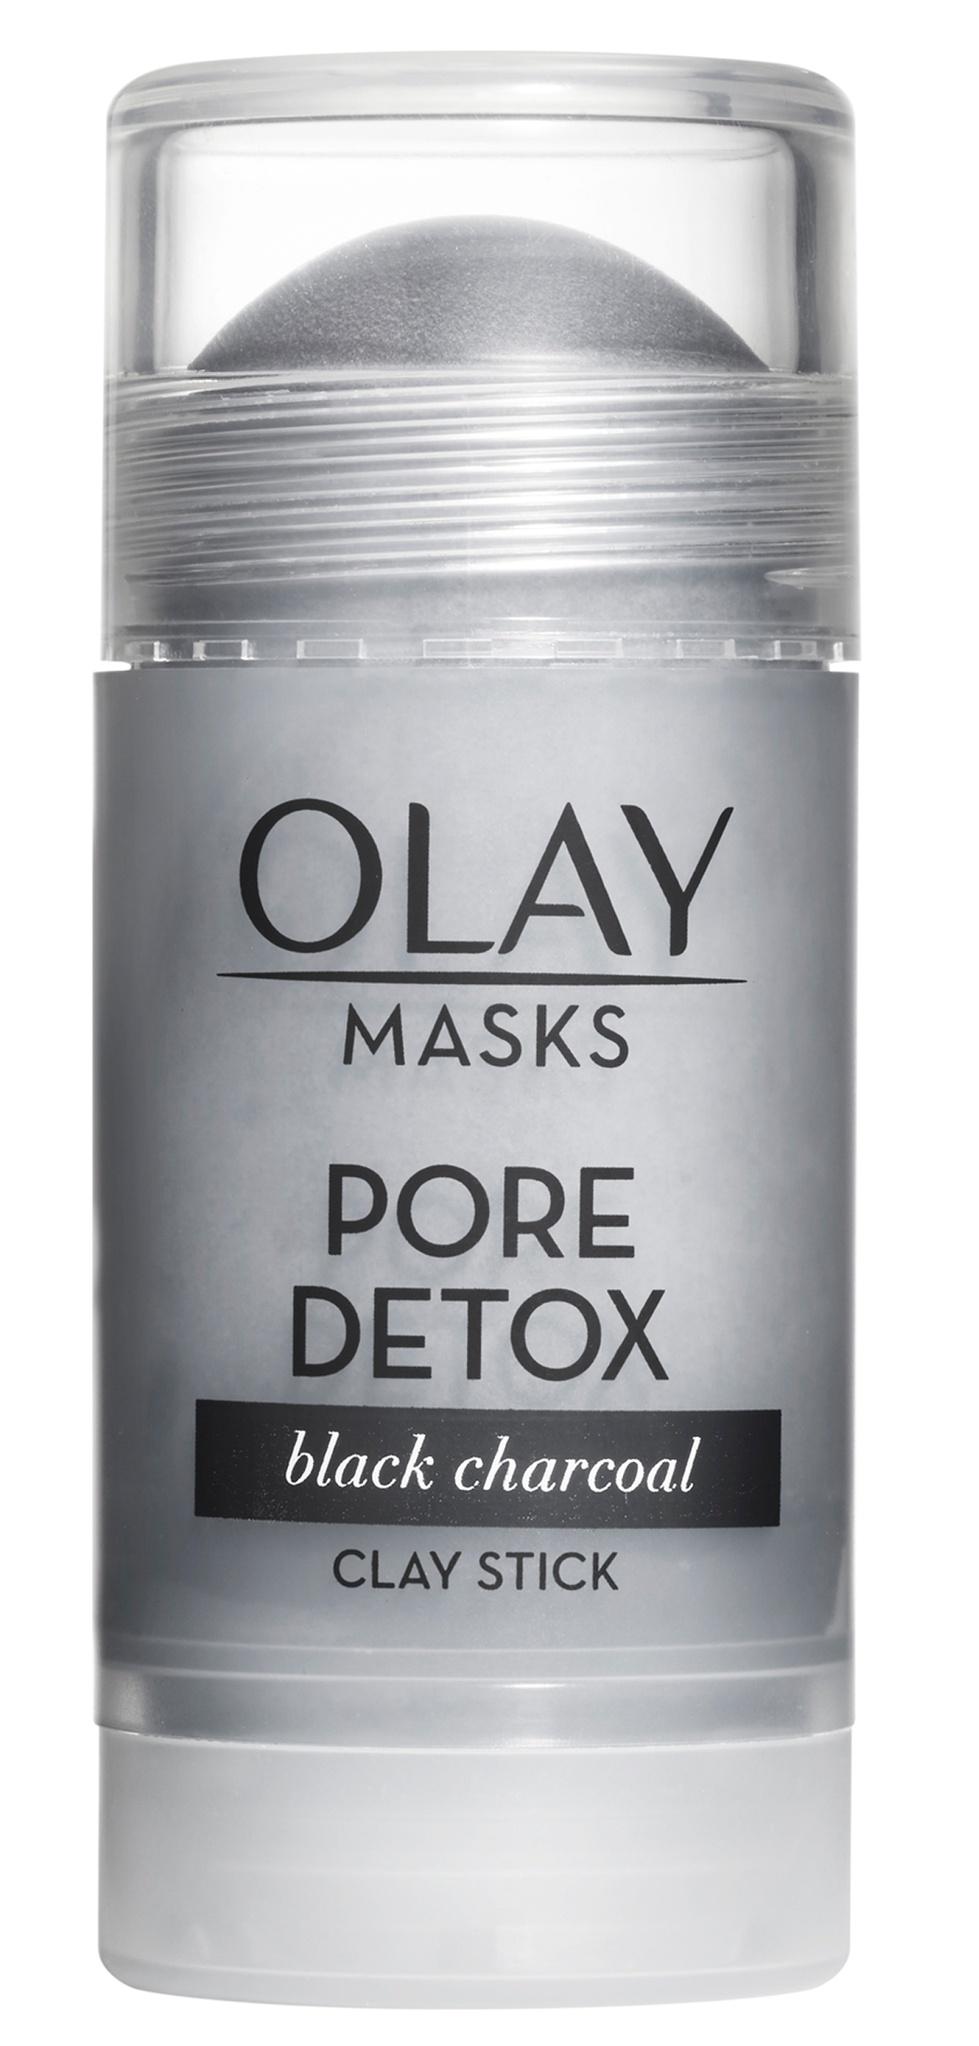 Olay Pore Detox Black Charcoal Clay Stick